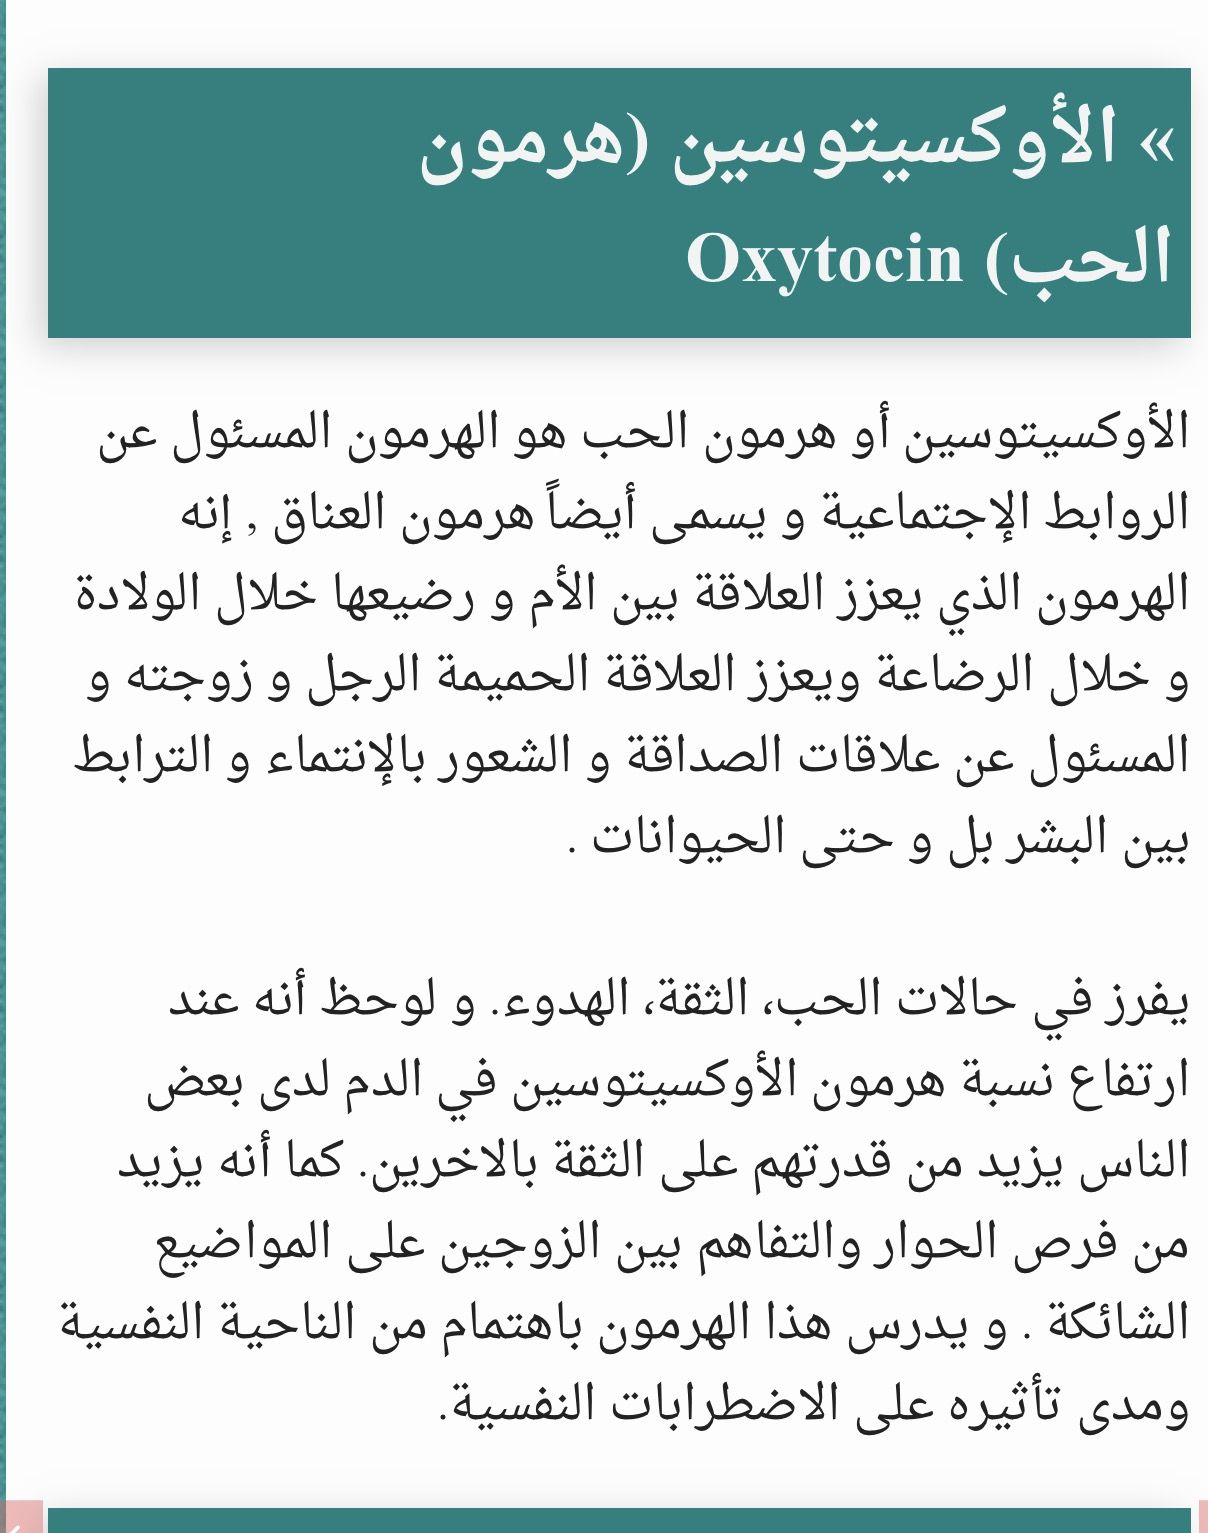 Pin By كرنفال On اقتباسات Oxytocin